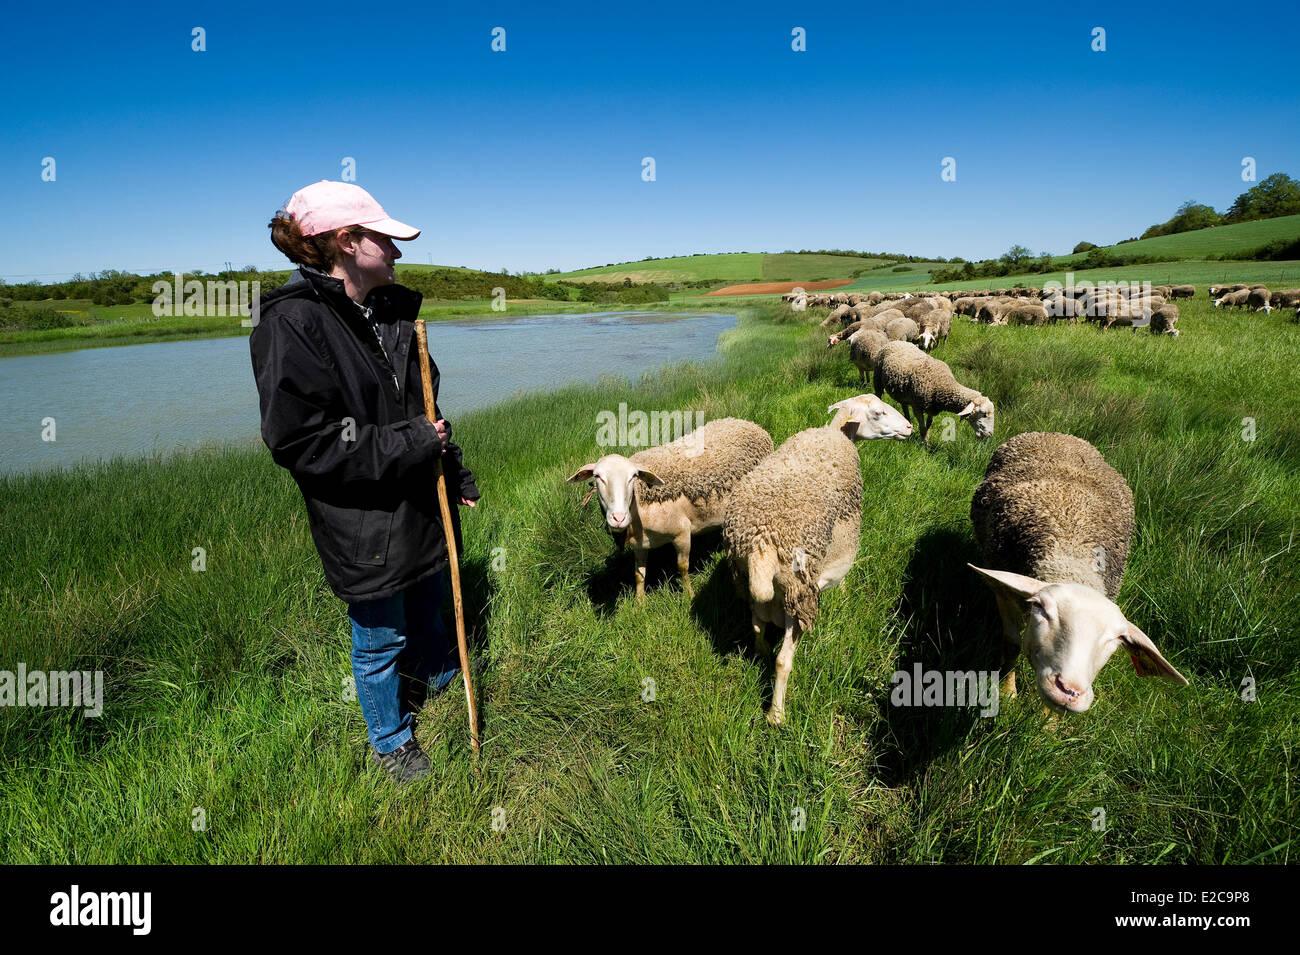 France, Aveyron, La Rouquette, the shepherd Severine Boudes and his flock - Stock Image